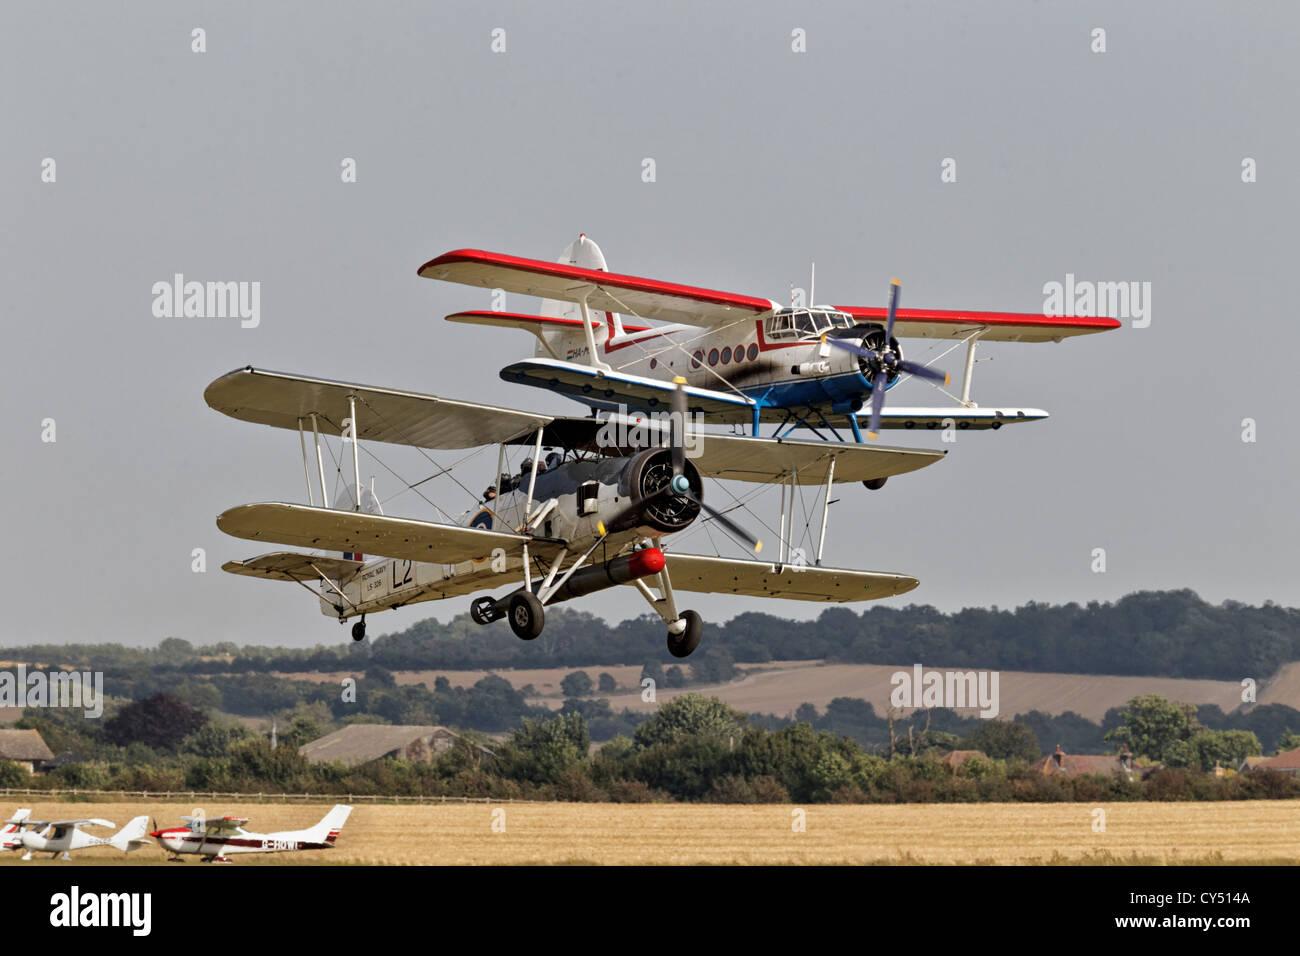 Fairey Swordfish and Antonov AN2 pairs take off - Stock Image